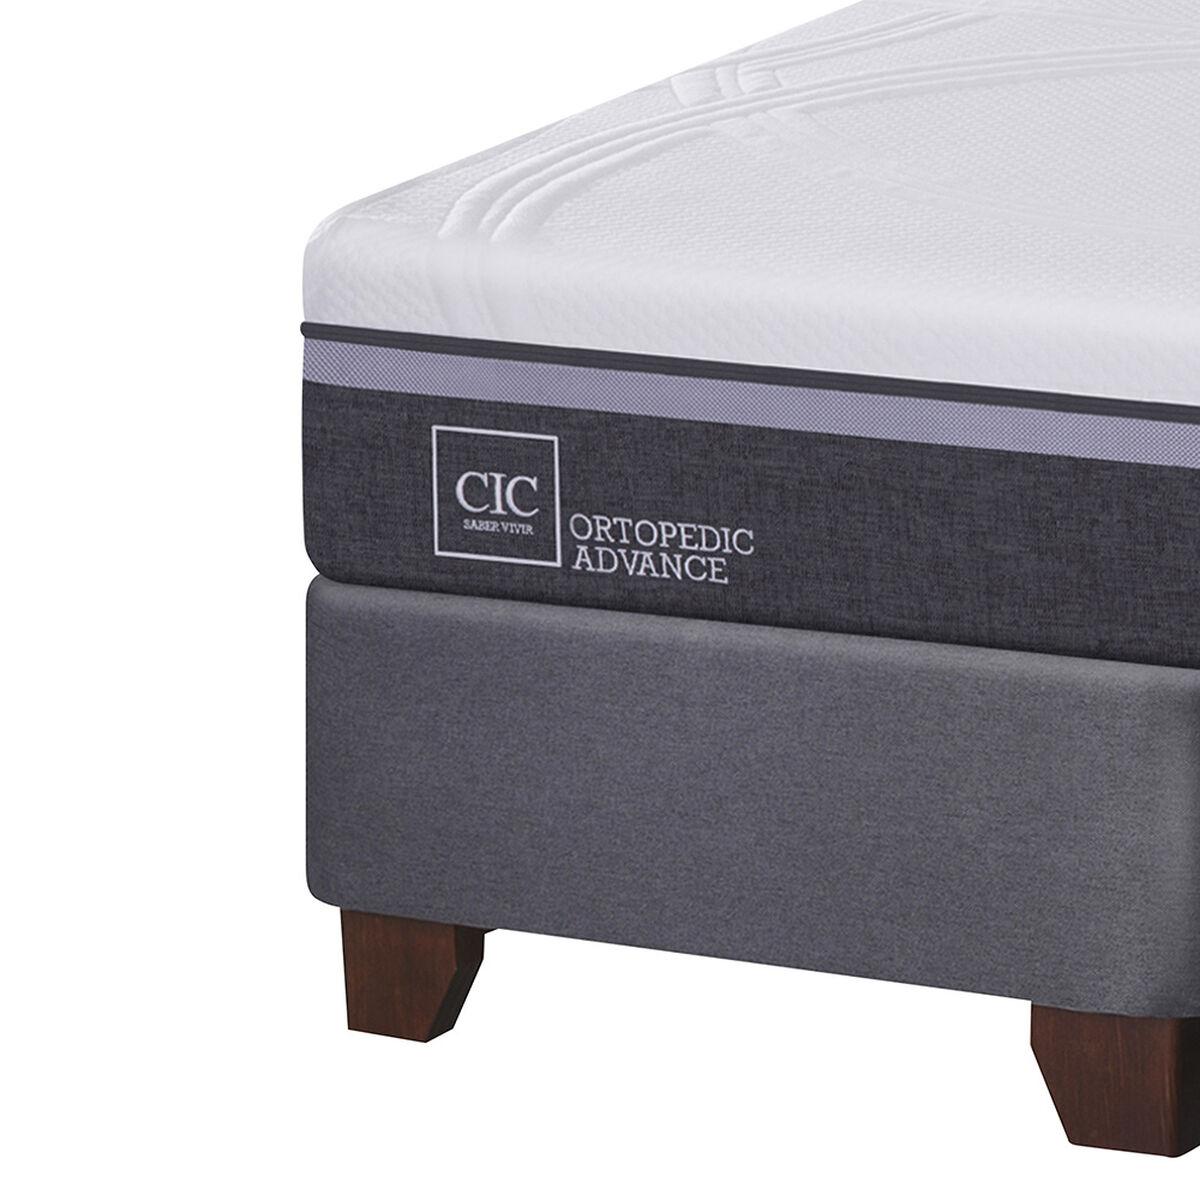 Box Spring Ortopedic Advance King Base Dividida + Mueble + Respaldo Baker